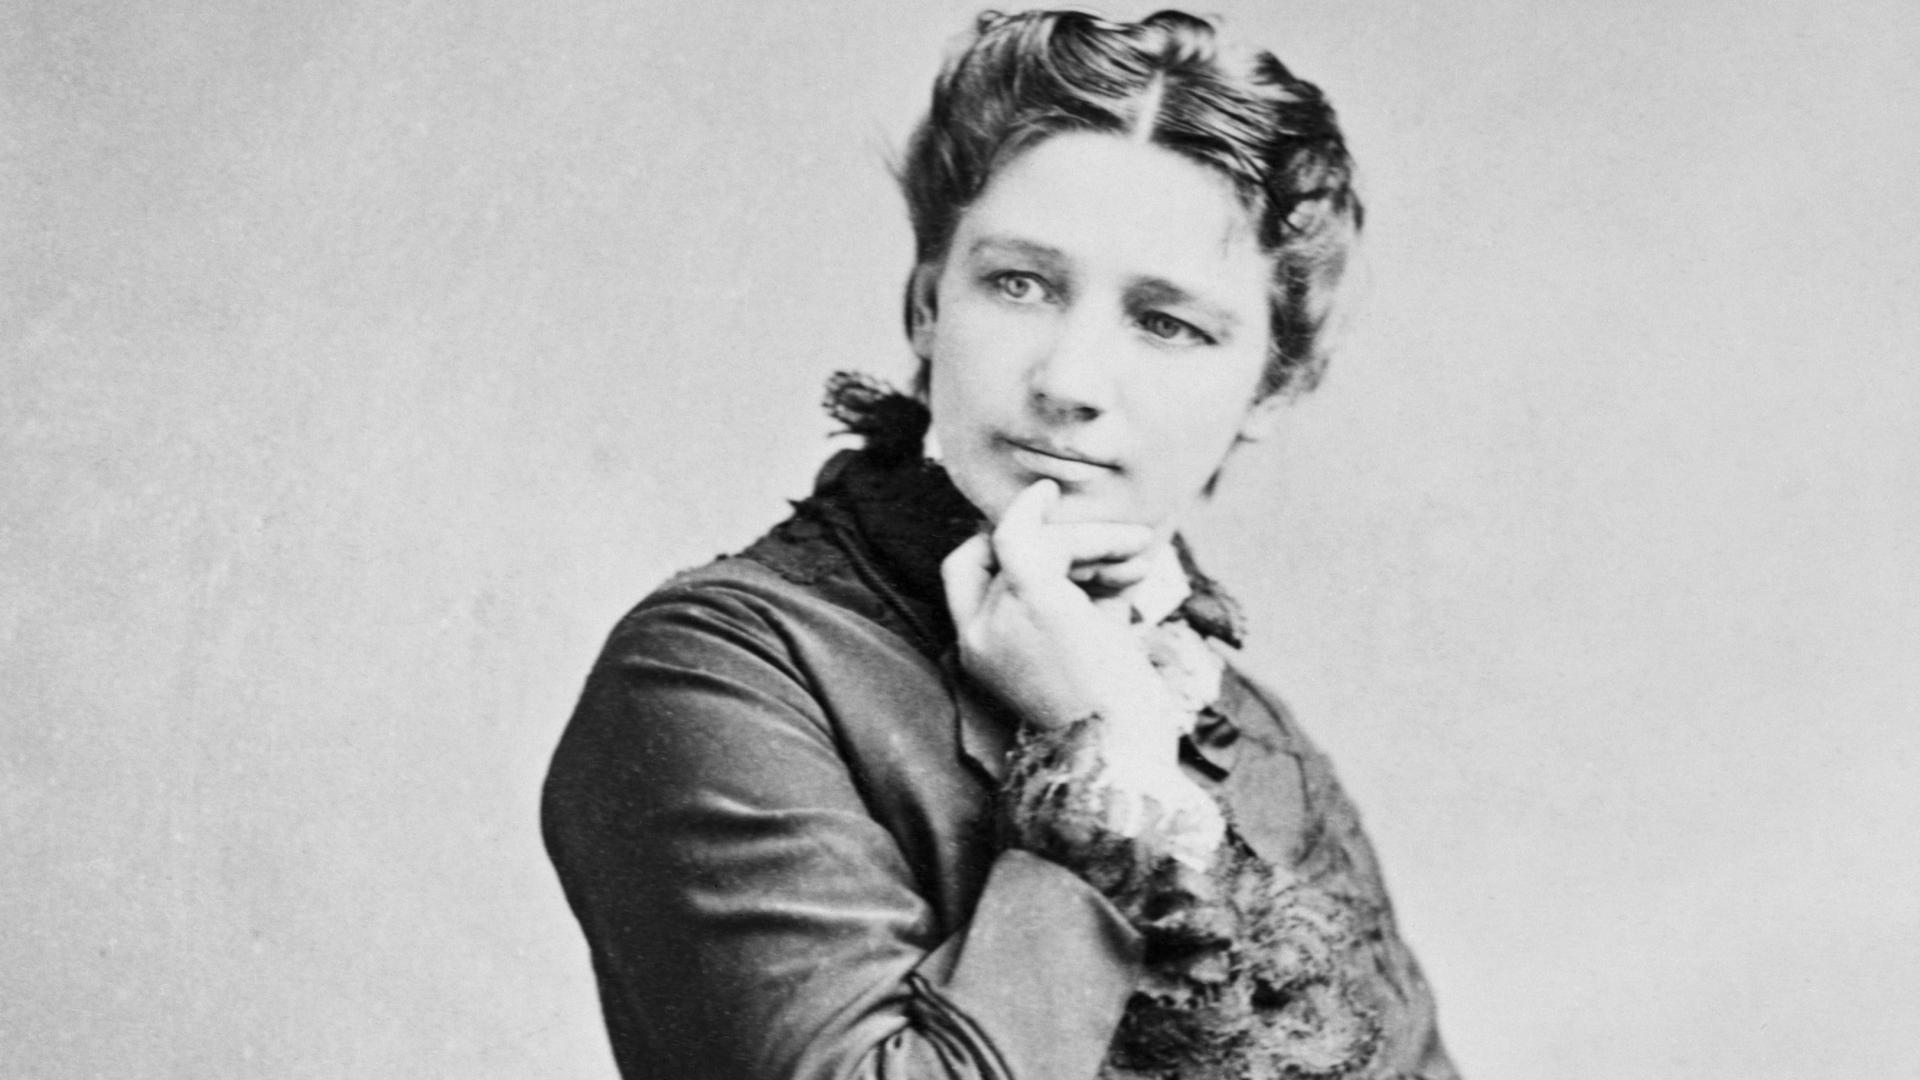 Victoria Claflin Woodhull, circa 1872. (Credit: Bettmann/Getty Images)